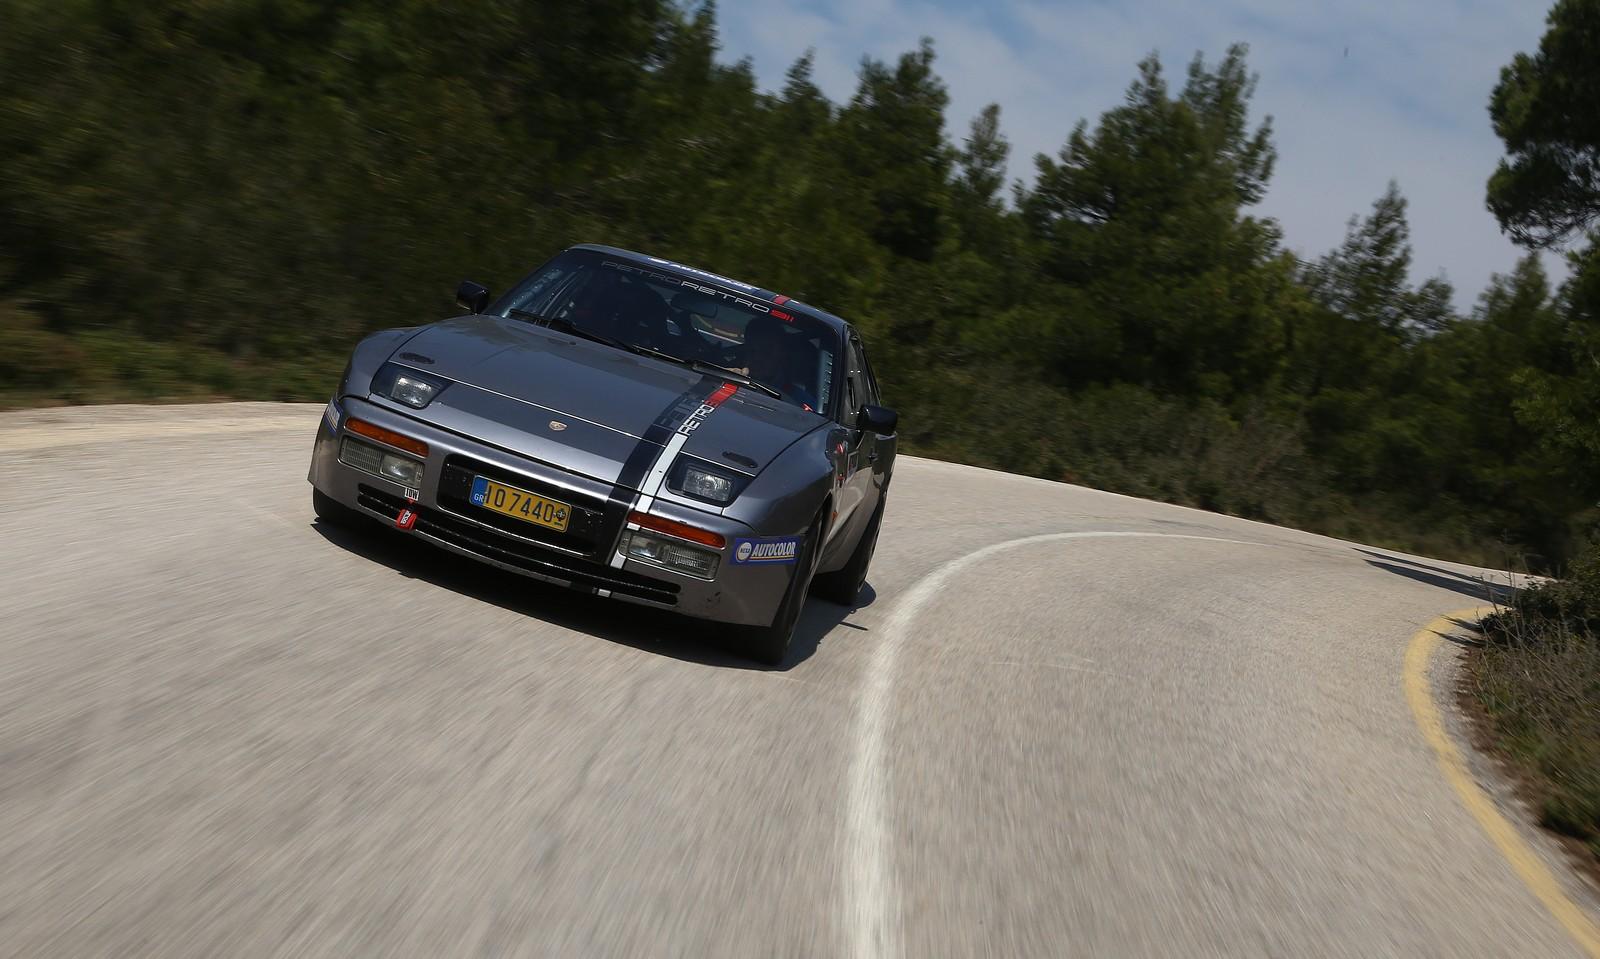 Porsche 844 Turbo